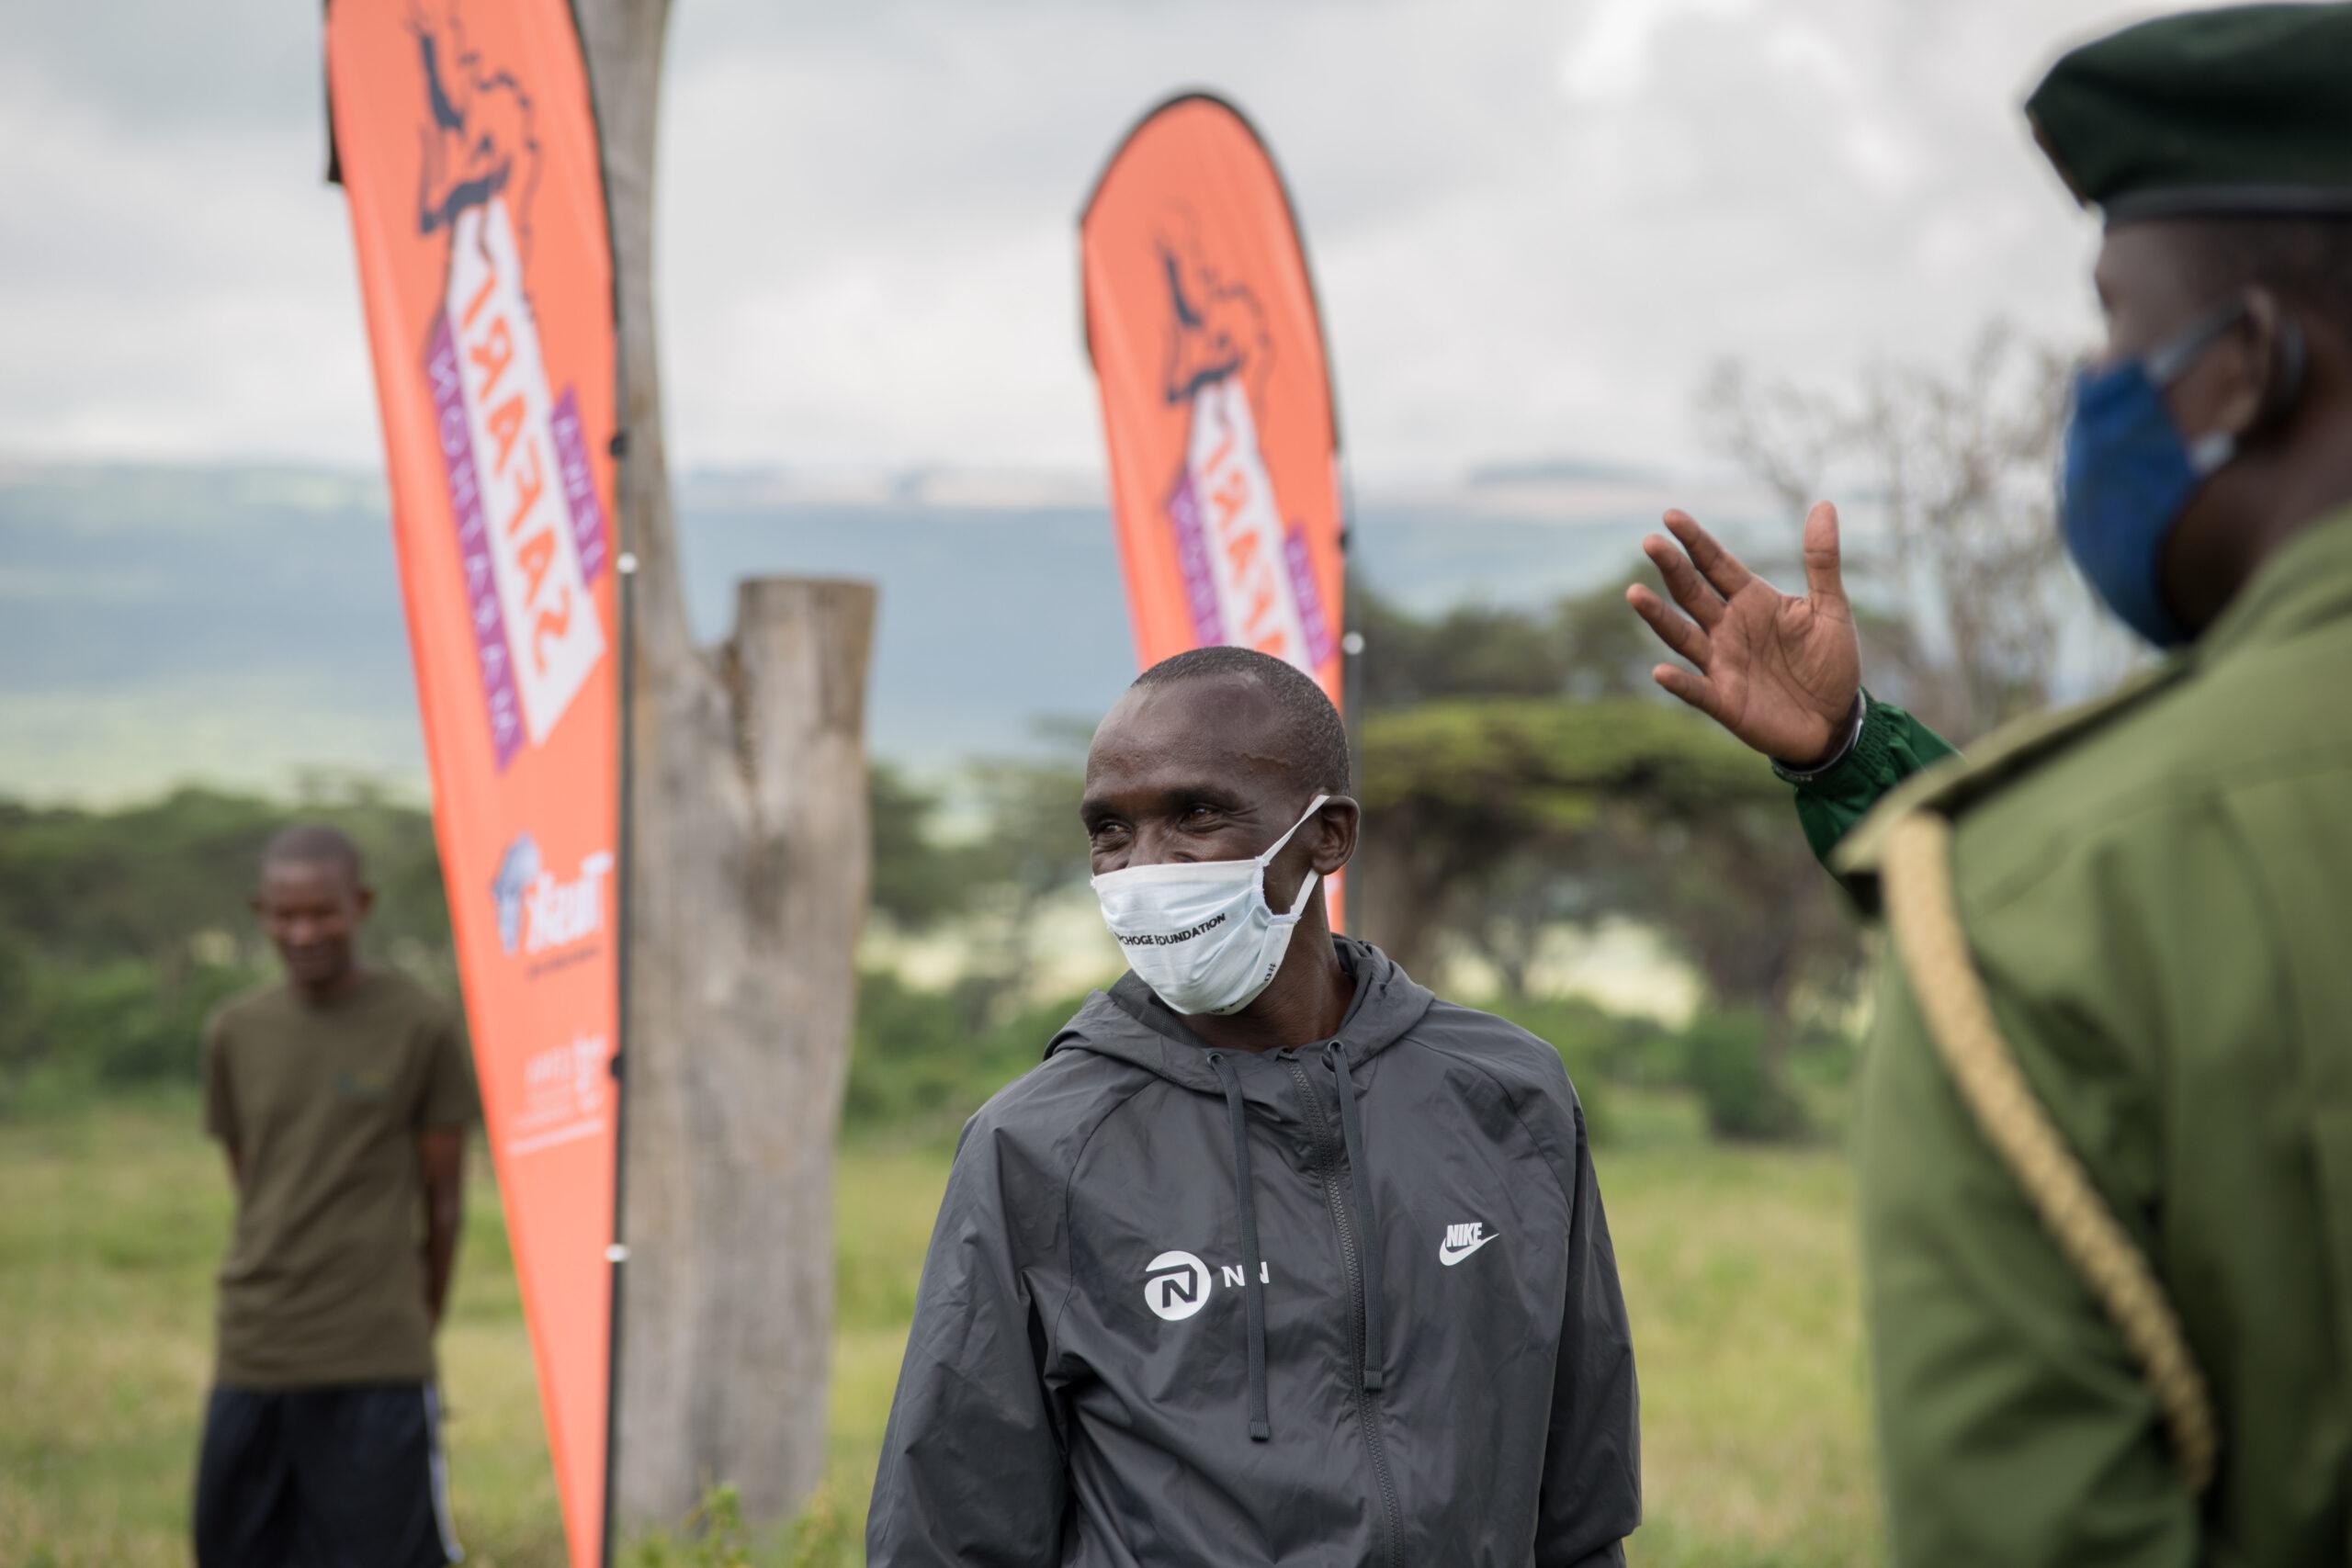 World's Fastest Marathoner Eliud Kipchoge Runs with Lewa Rangers to Encourage Support for the Virtual Lewa Safari Marathon